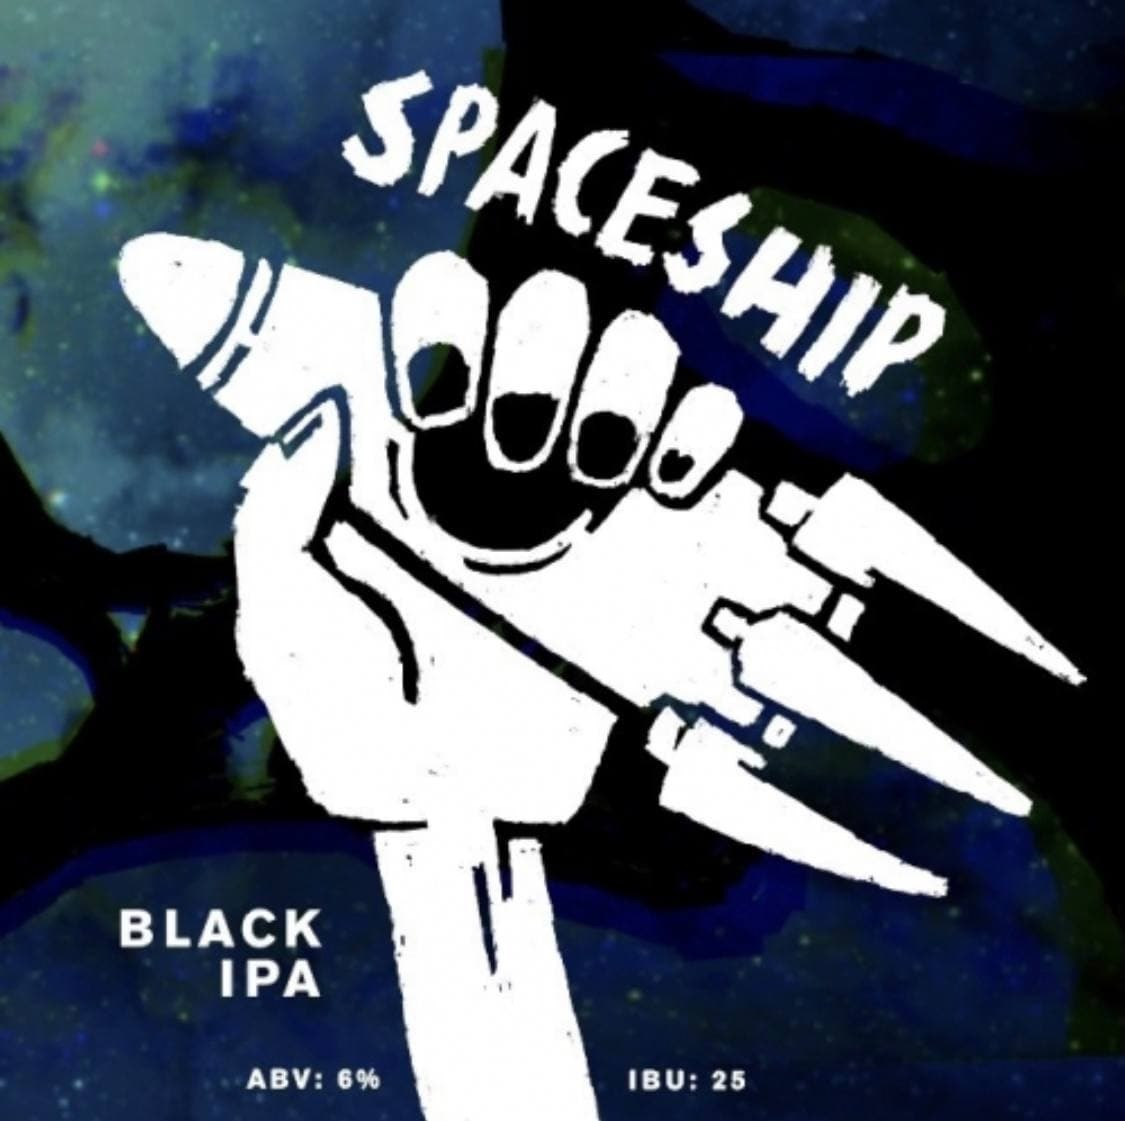 https://static-sl.insales.ru/images/products/1/2489/445442489/Пиво_Red_Rocket_Spaceship.jpg